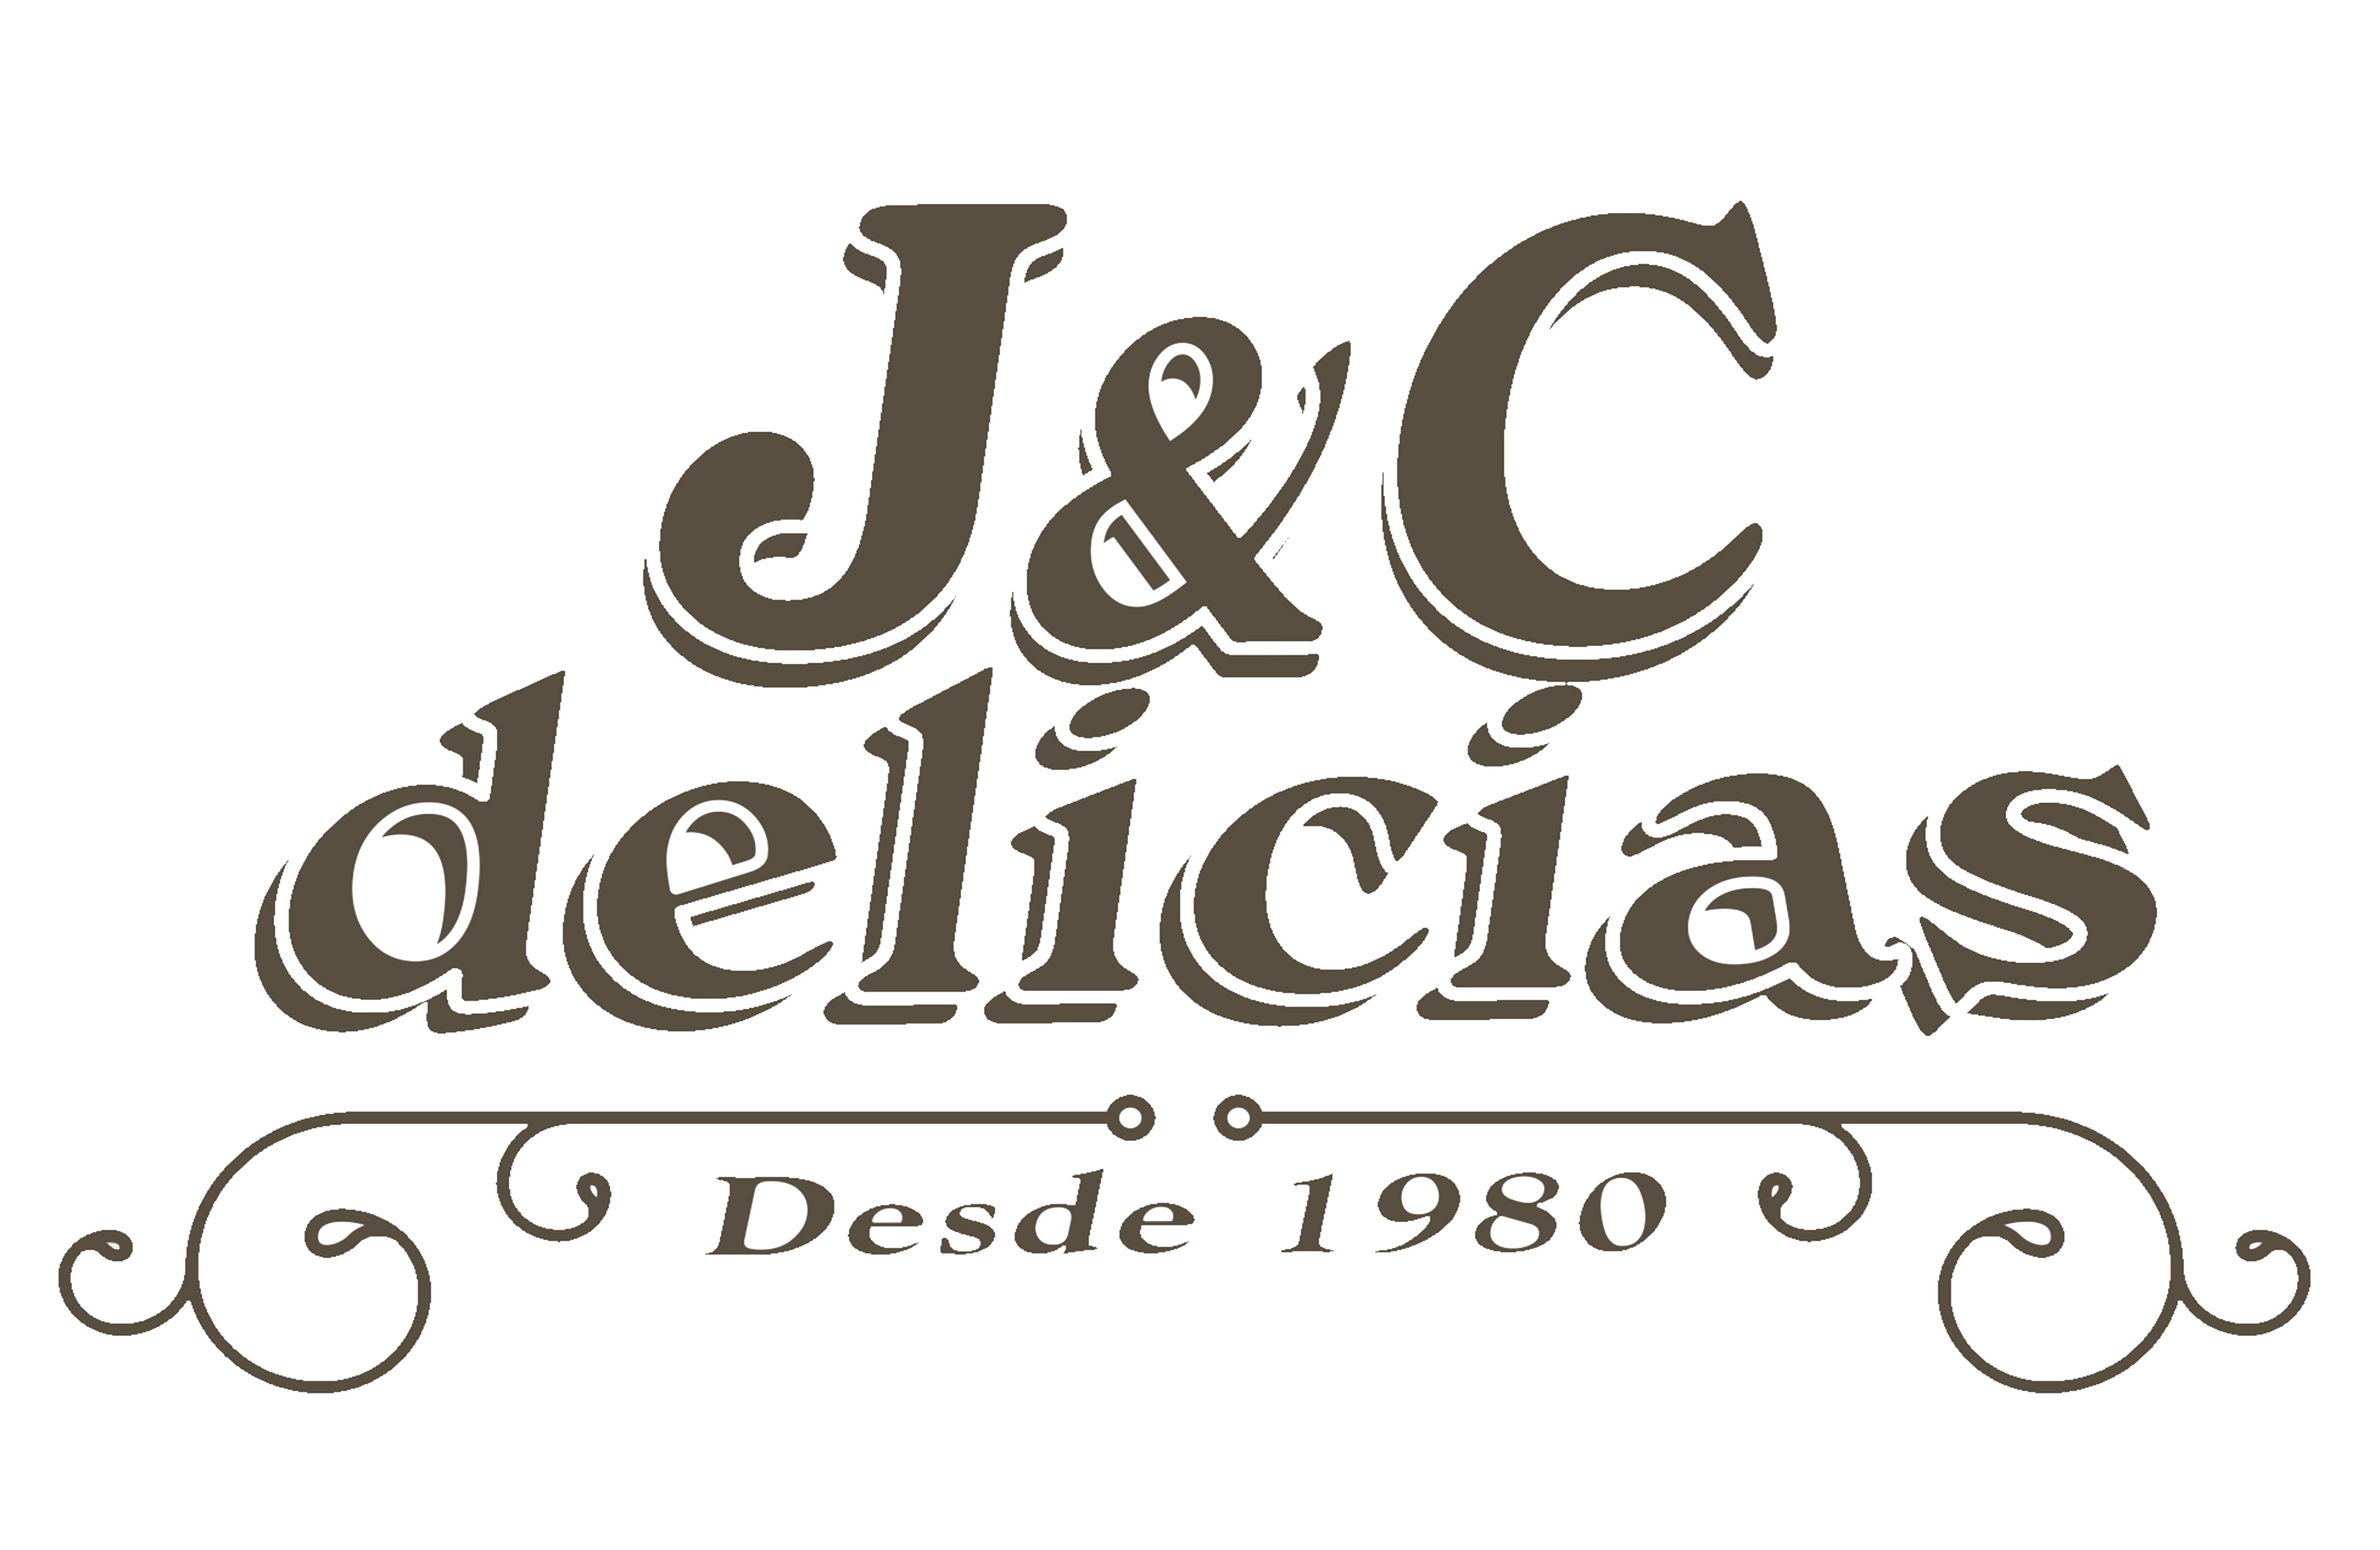 J&C Delicias Premium Plaza Medellín